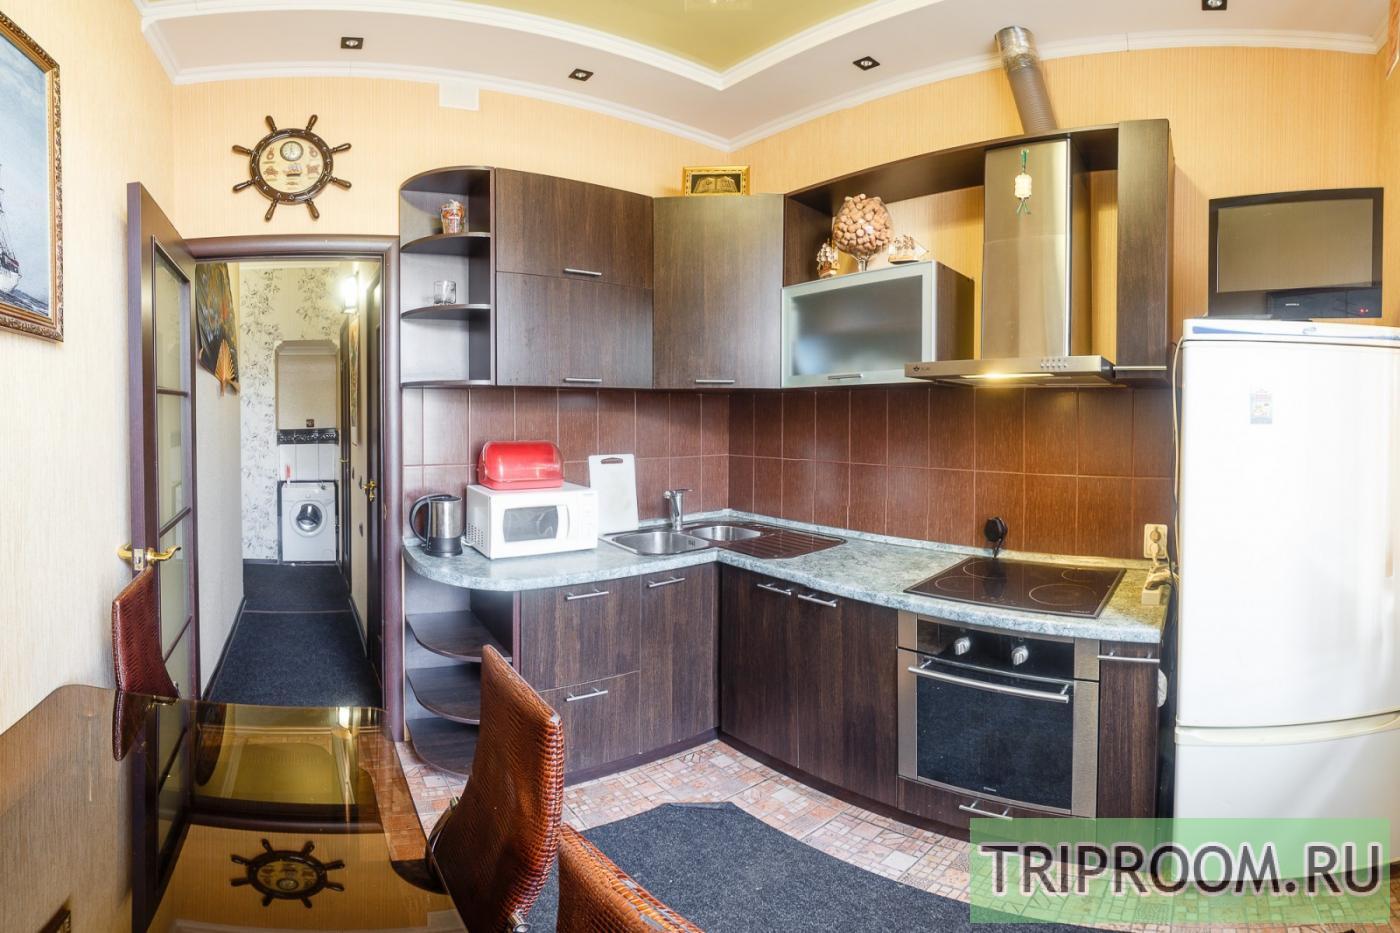 3-комнатная квартира посуточно (вариант № 15948), ул. Назарбаева улица, фото № 16